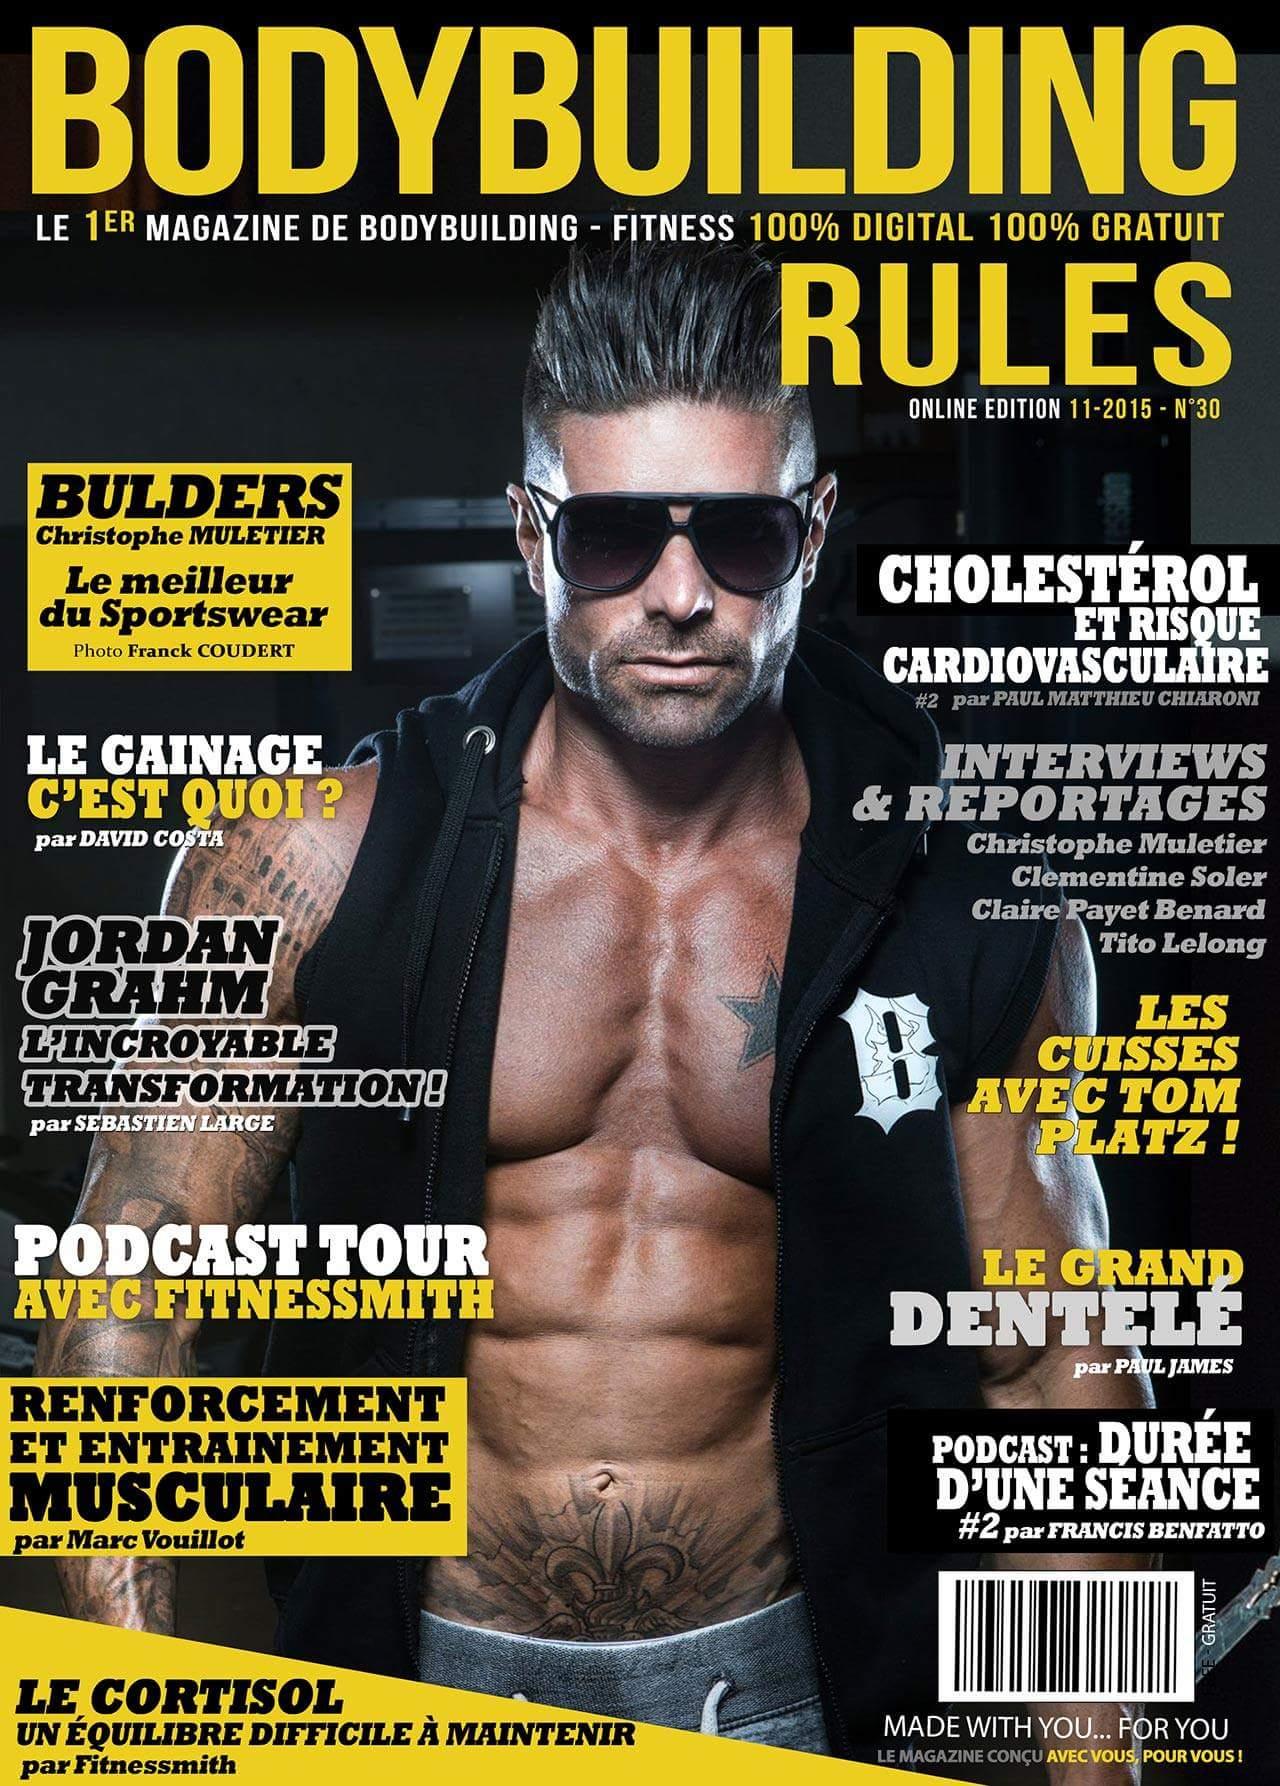 Magazine bodybuilding-rules n30